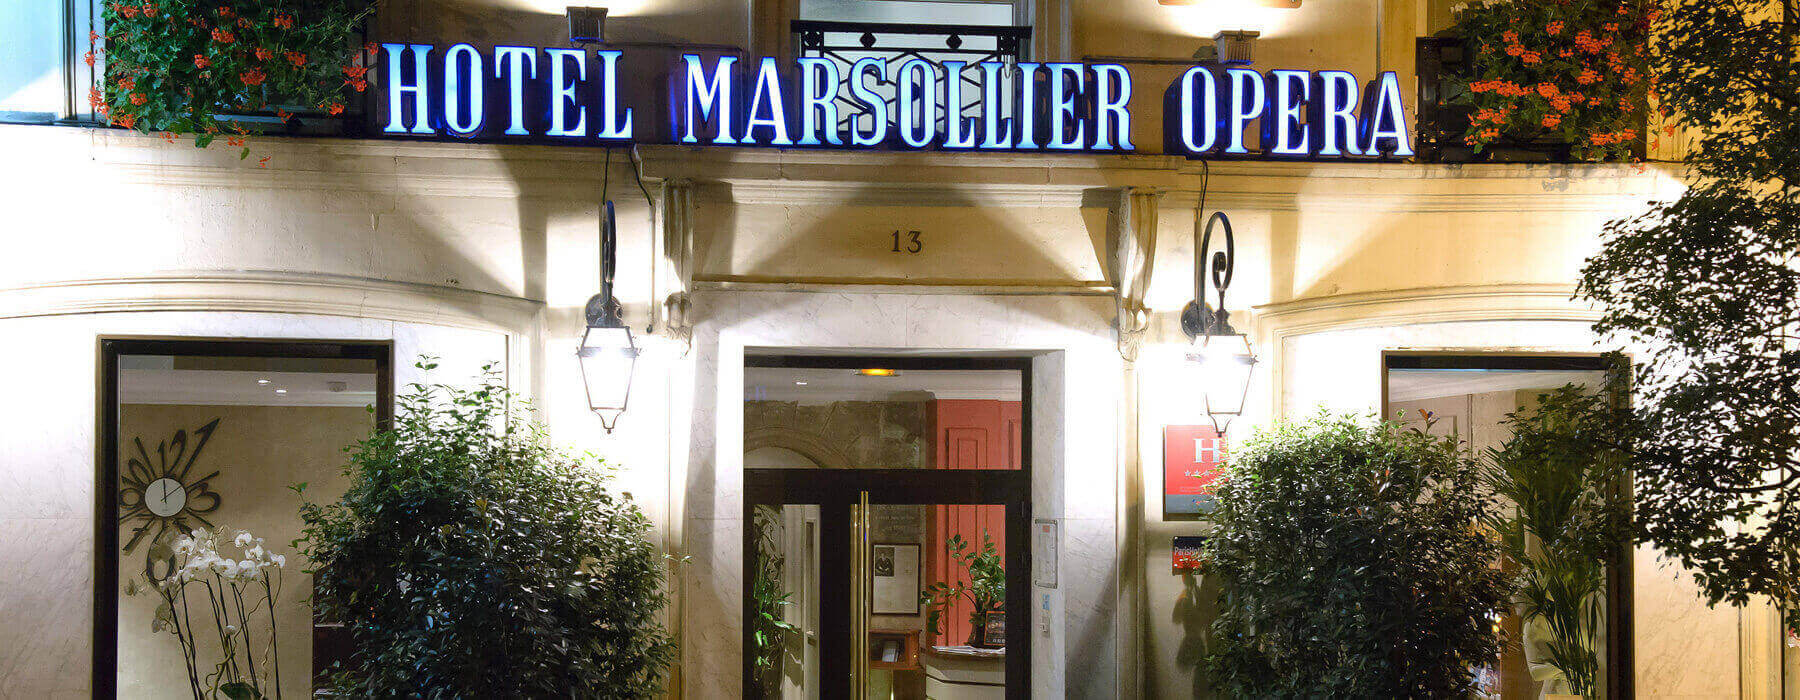 Hotel Louvre Marsollier Paris